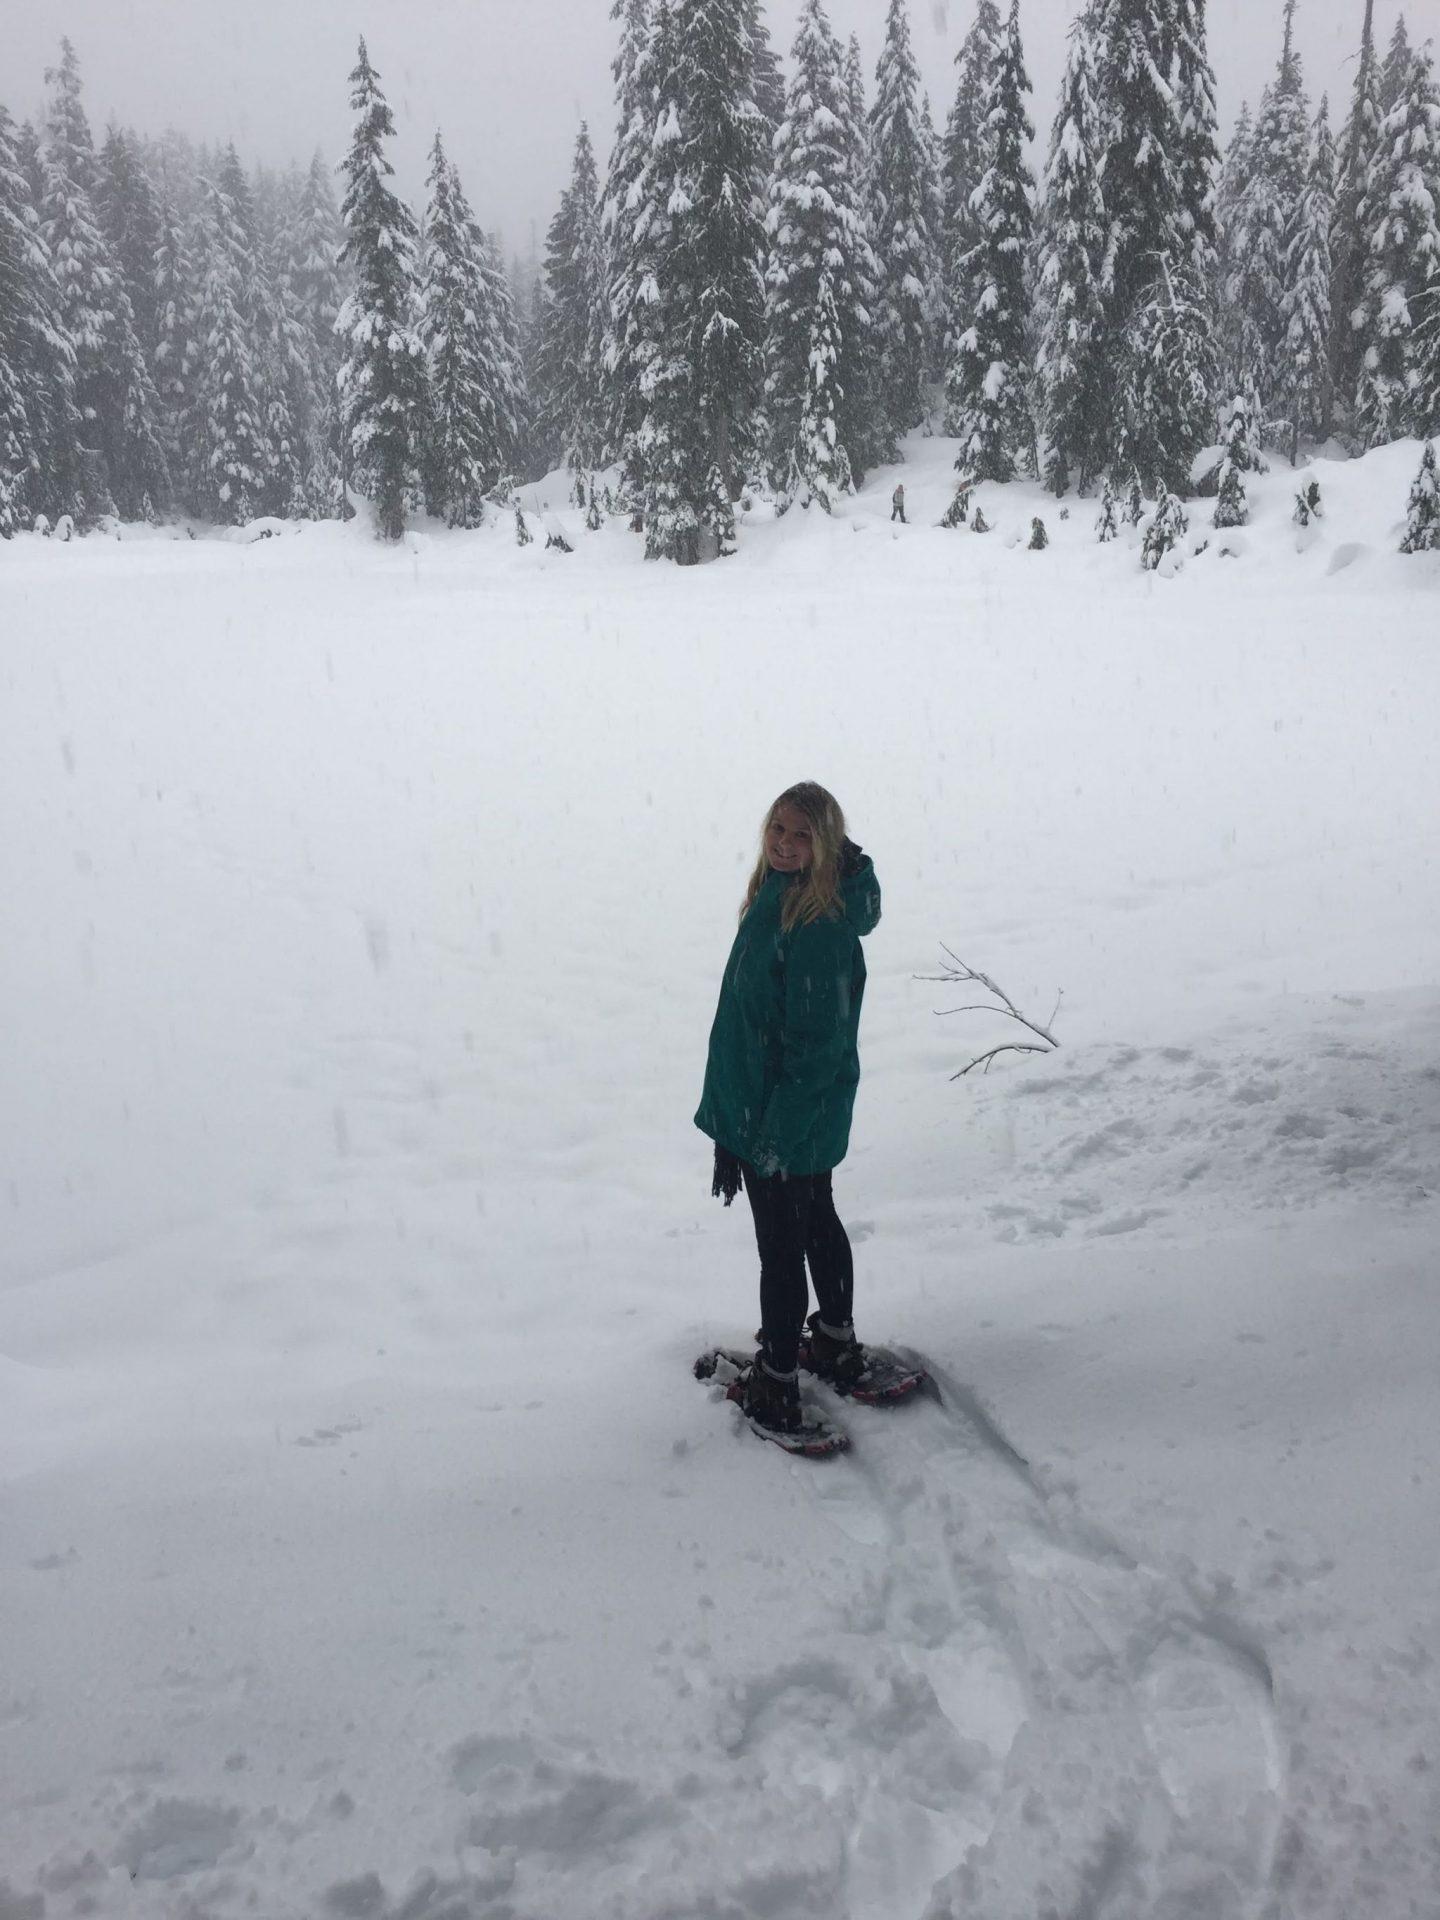 Laura on Mount Seymour, Vancouver